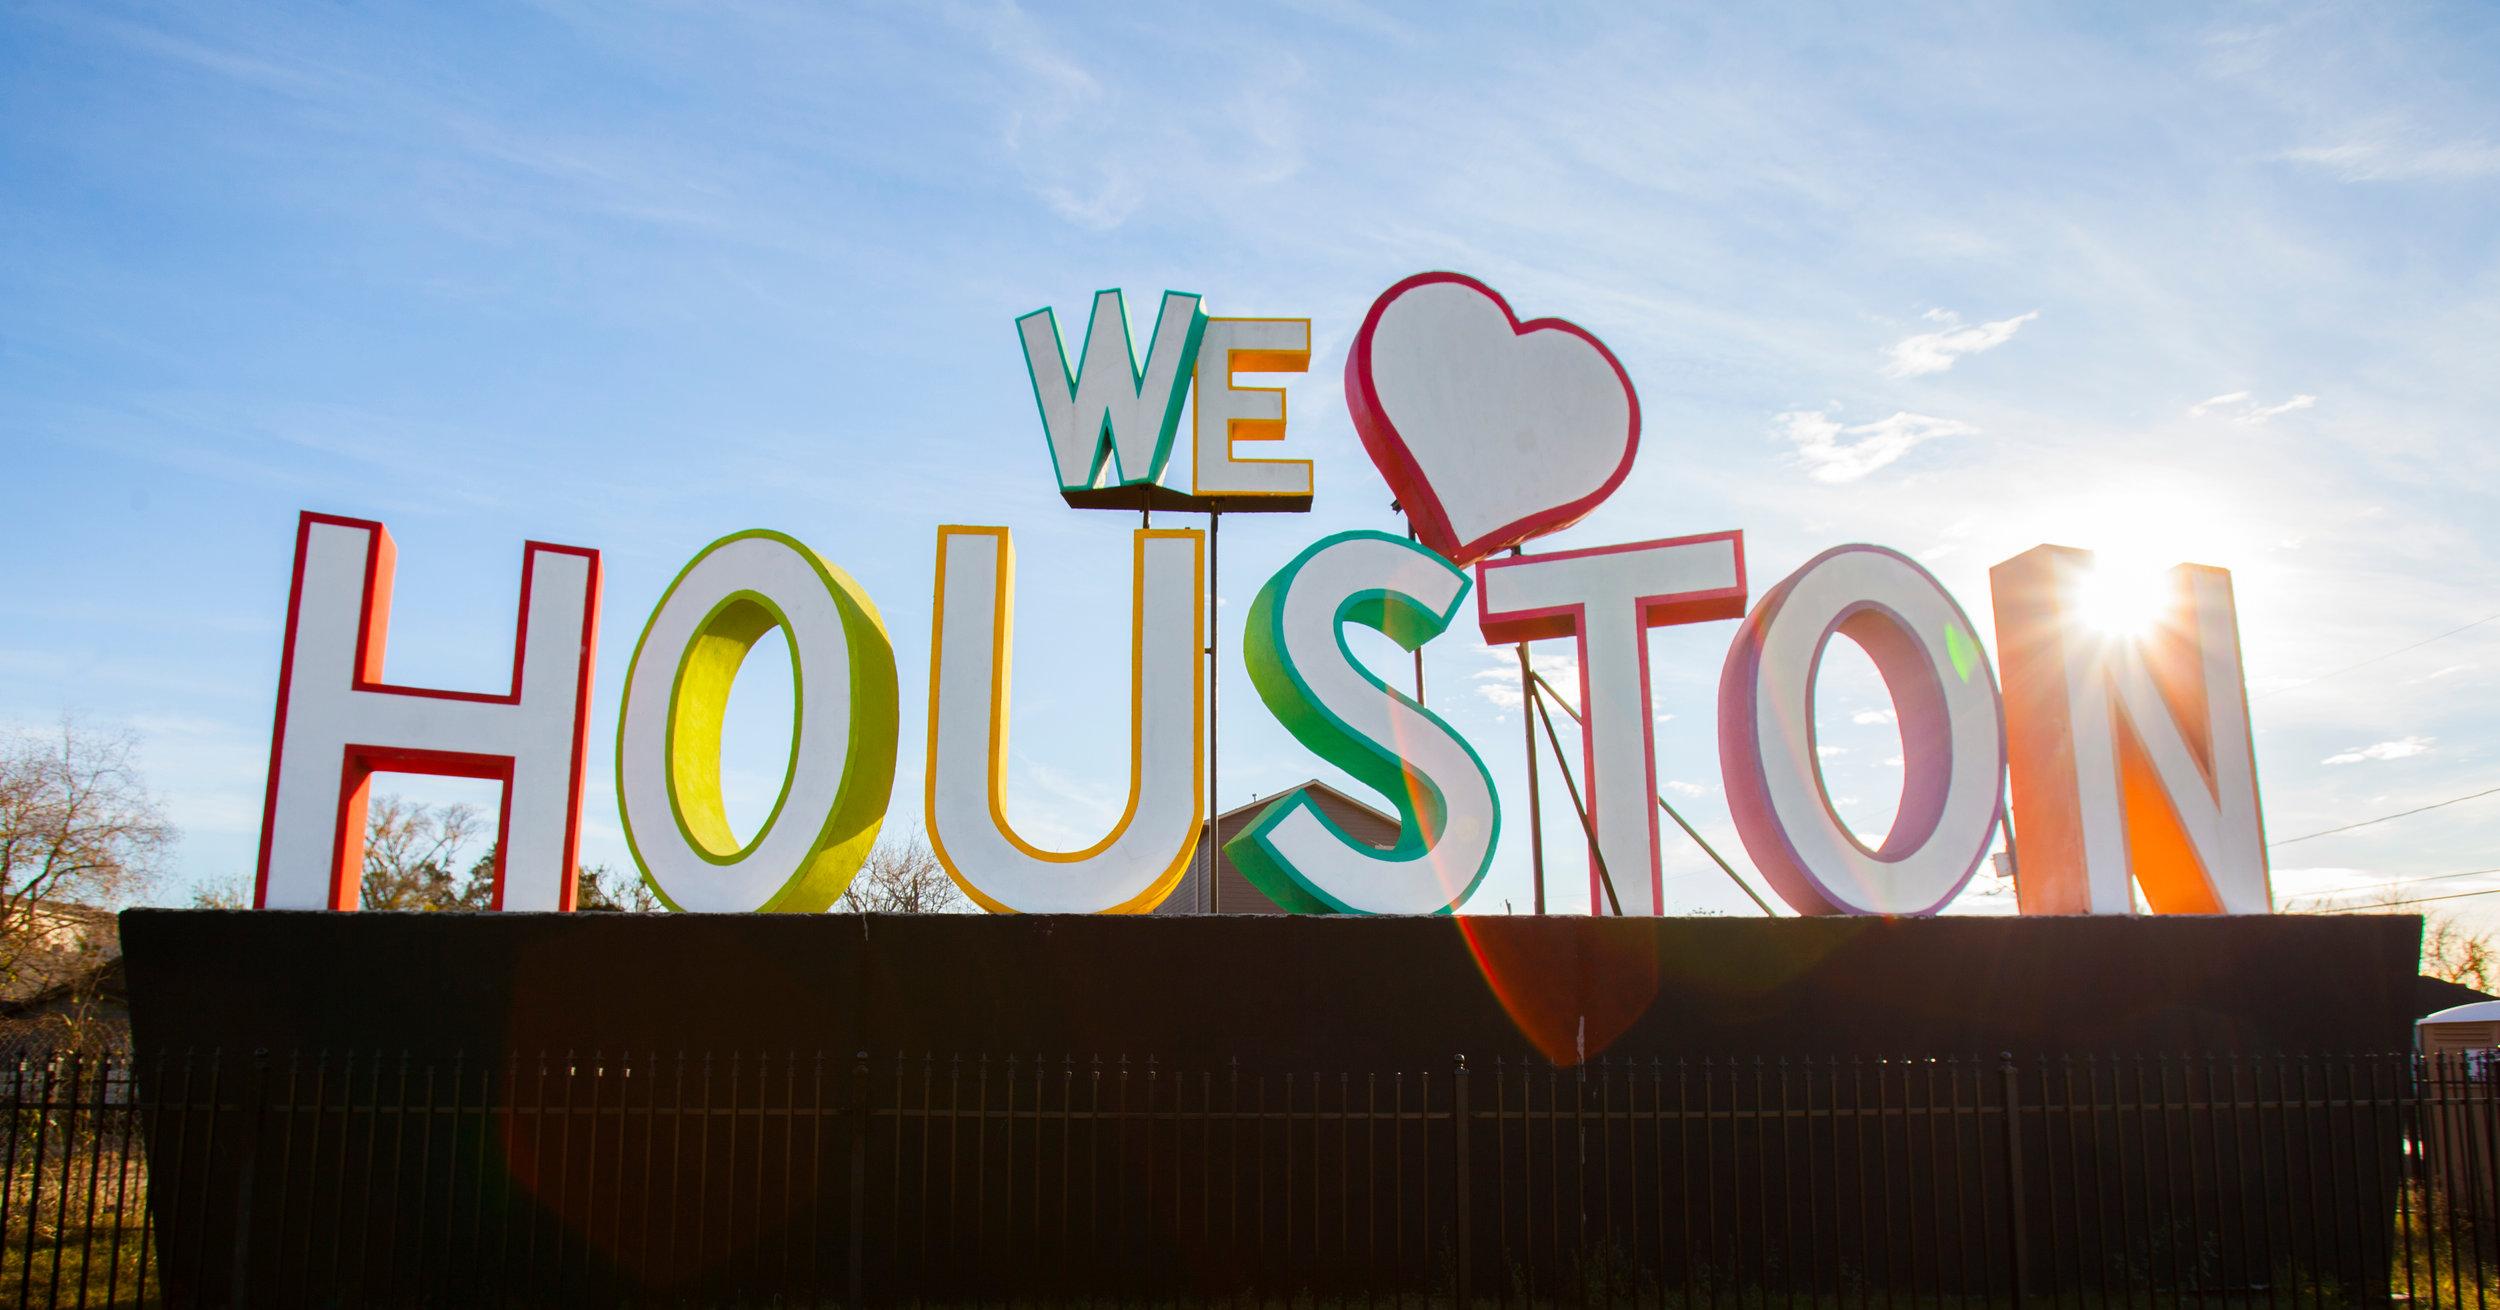 We__Heart__Houston_2_SVKLYKpq_8sqw8qrTedsqWs18q0ABlZBh_rgb_l.jpg